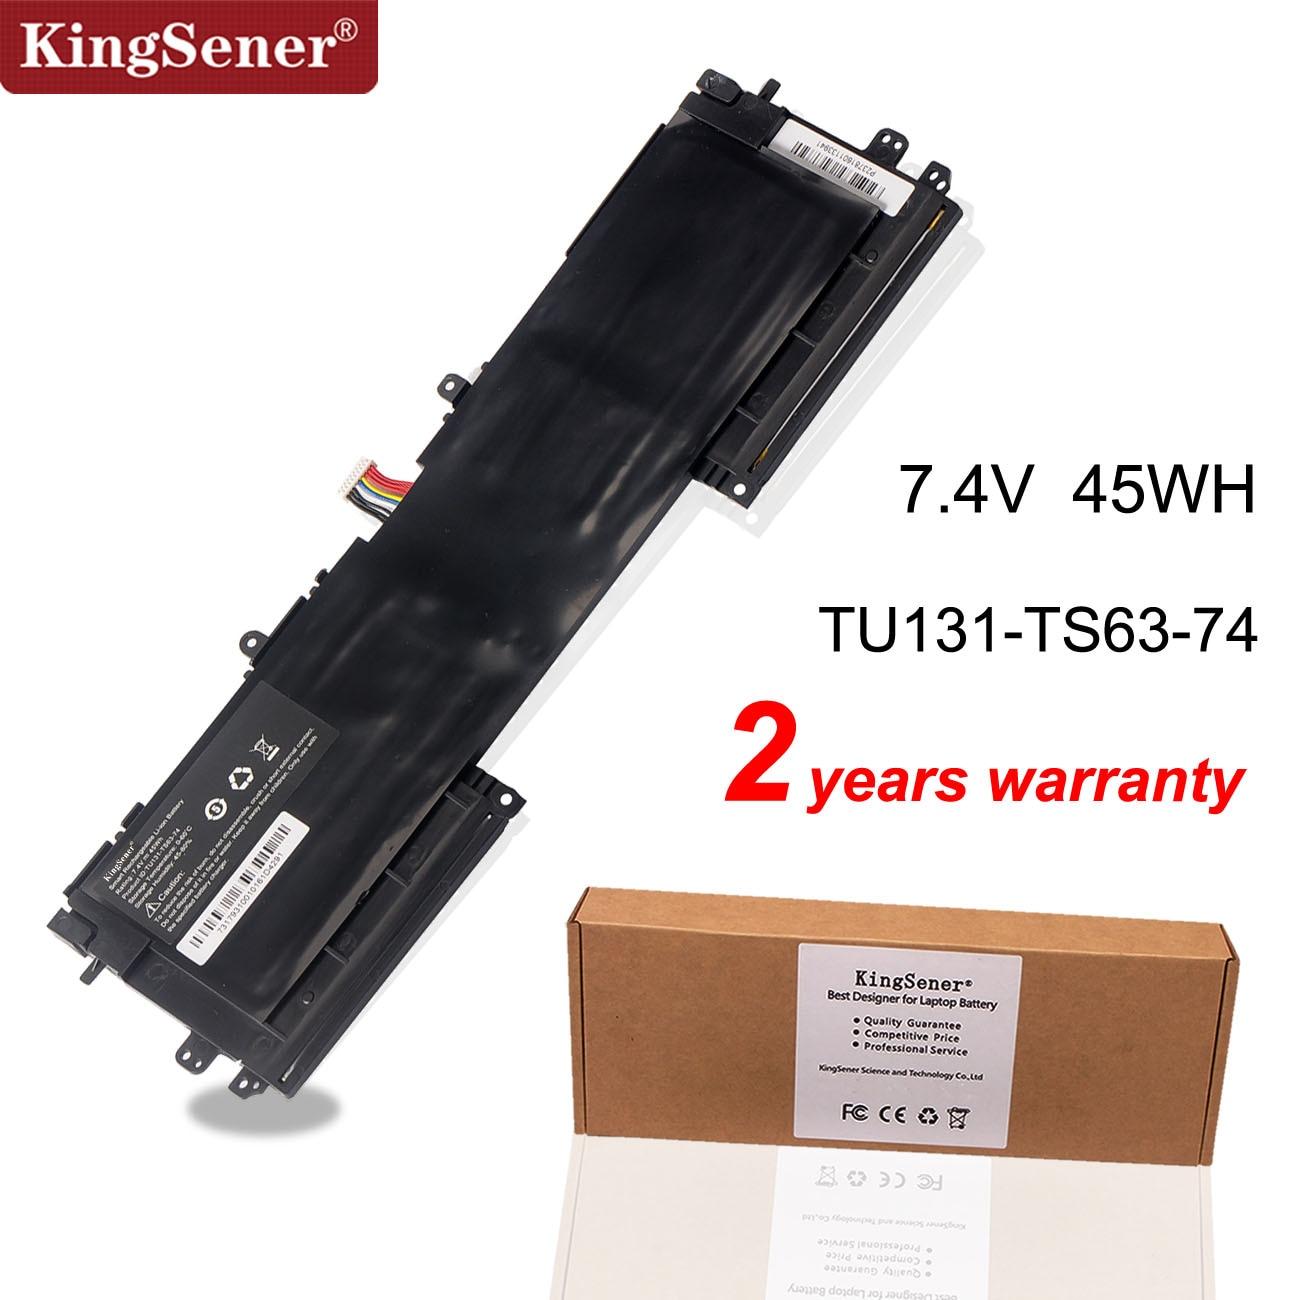 KingSener 7.4V 45WH TU131-TS63-74 TU131 Laptop Battery For DELL XPS13 8808 U13S881 U33X UX32K U731 TU131-TS63-74